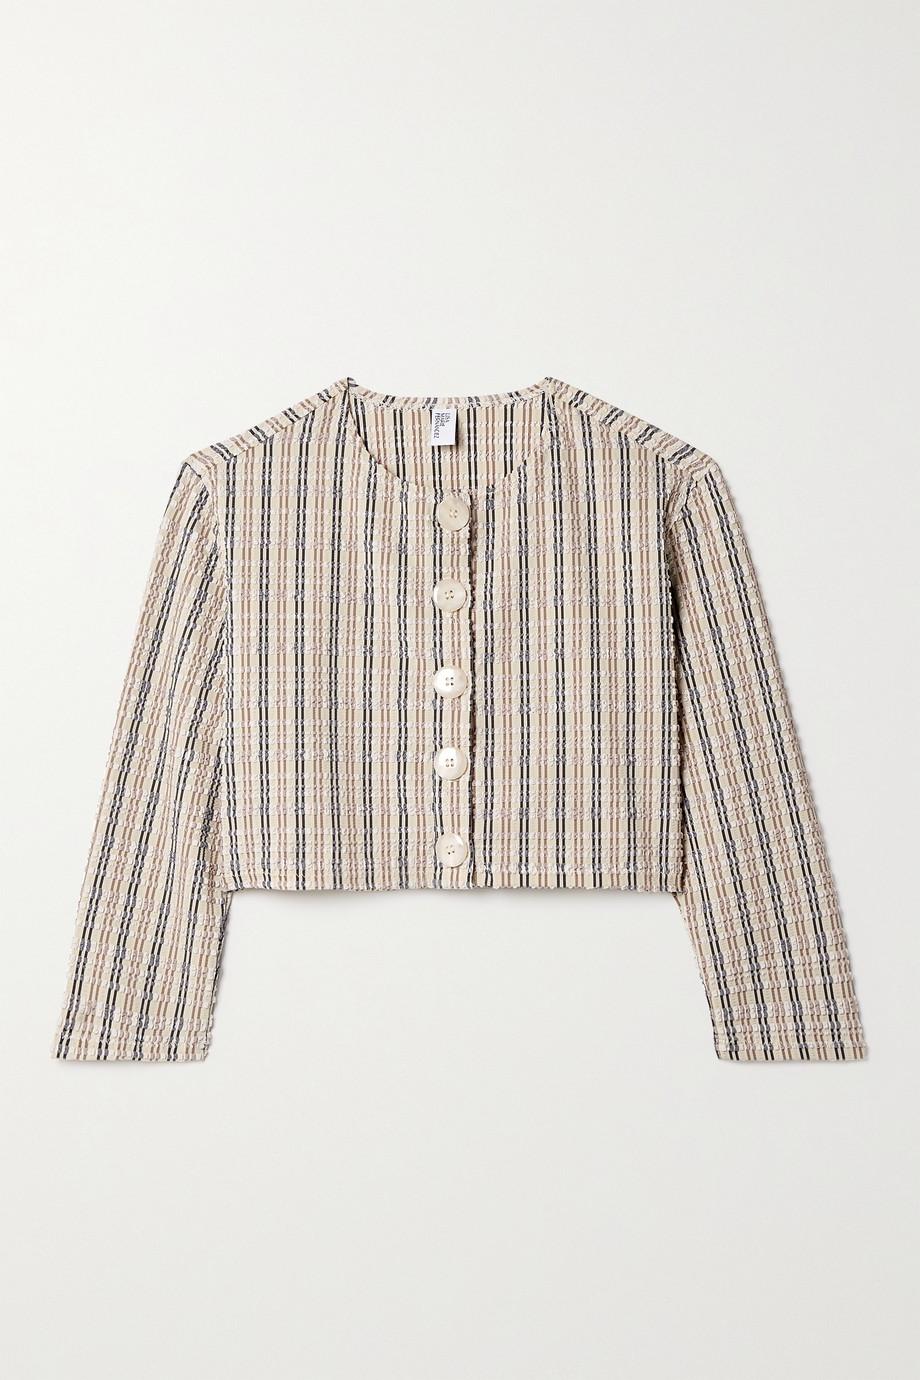 Lisa Marie Fernandez + NET SUSTAIN cropped striped seersucker cardigan